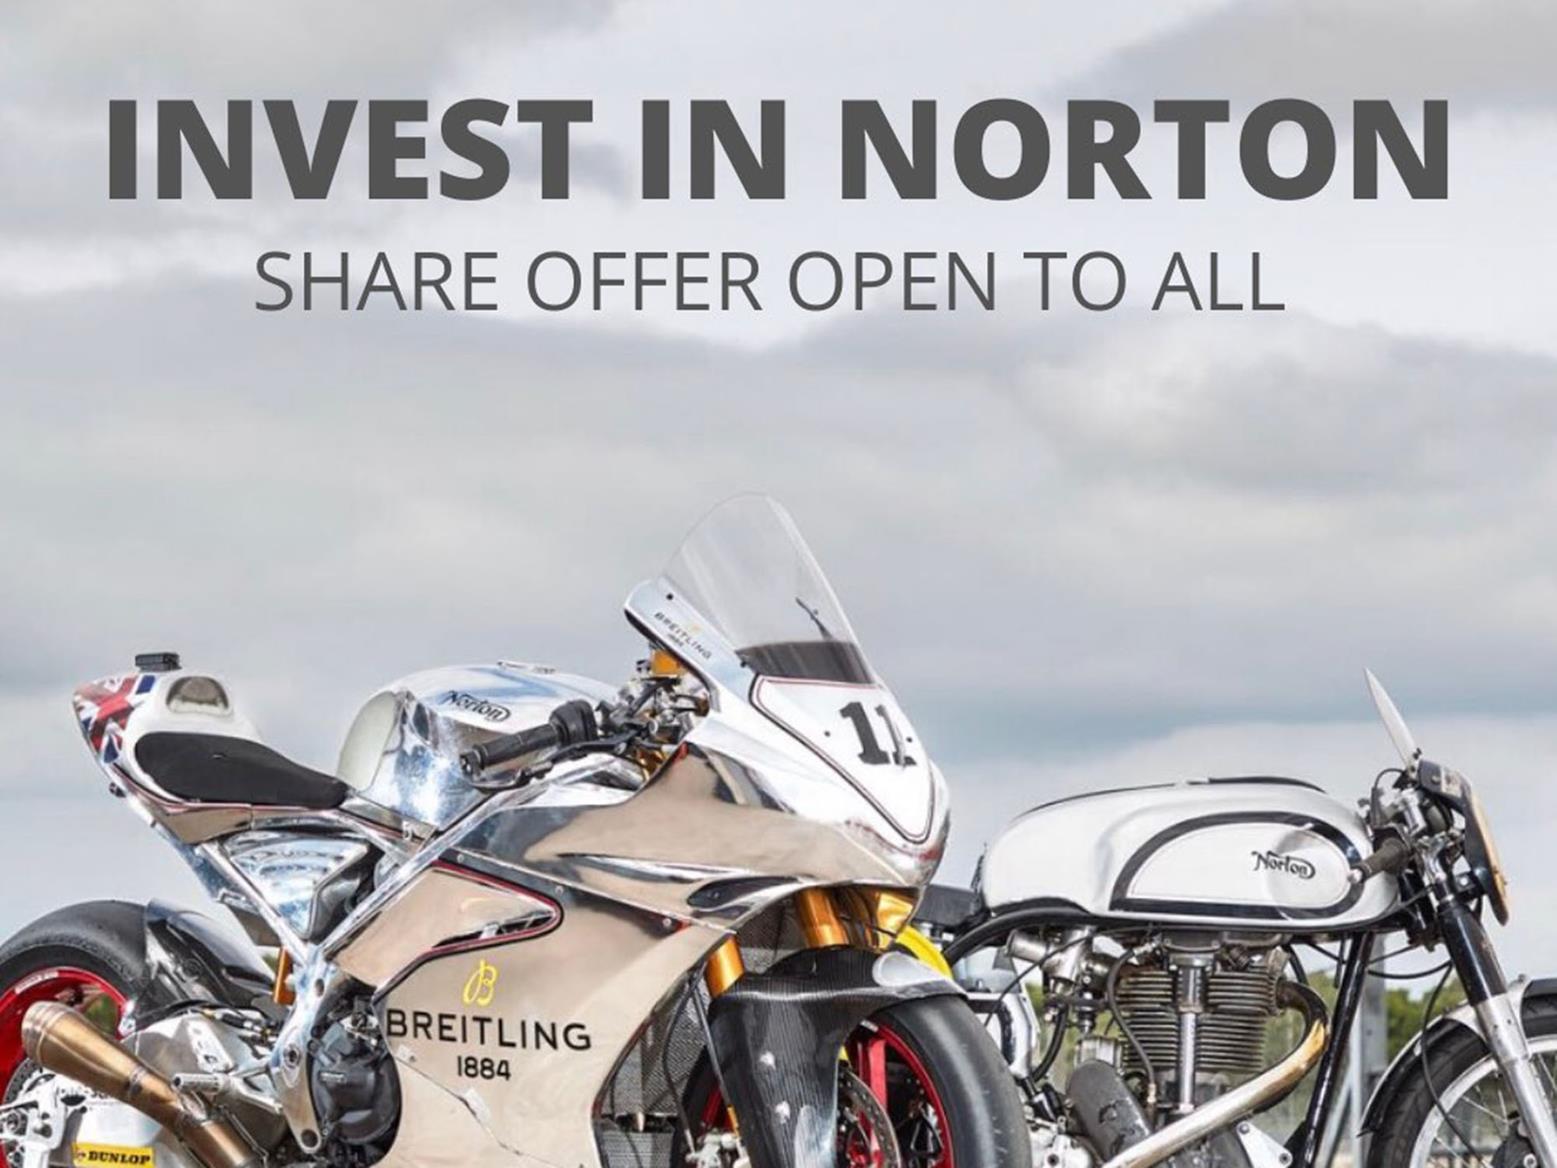 Norton investment campaign